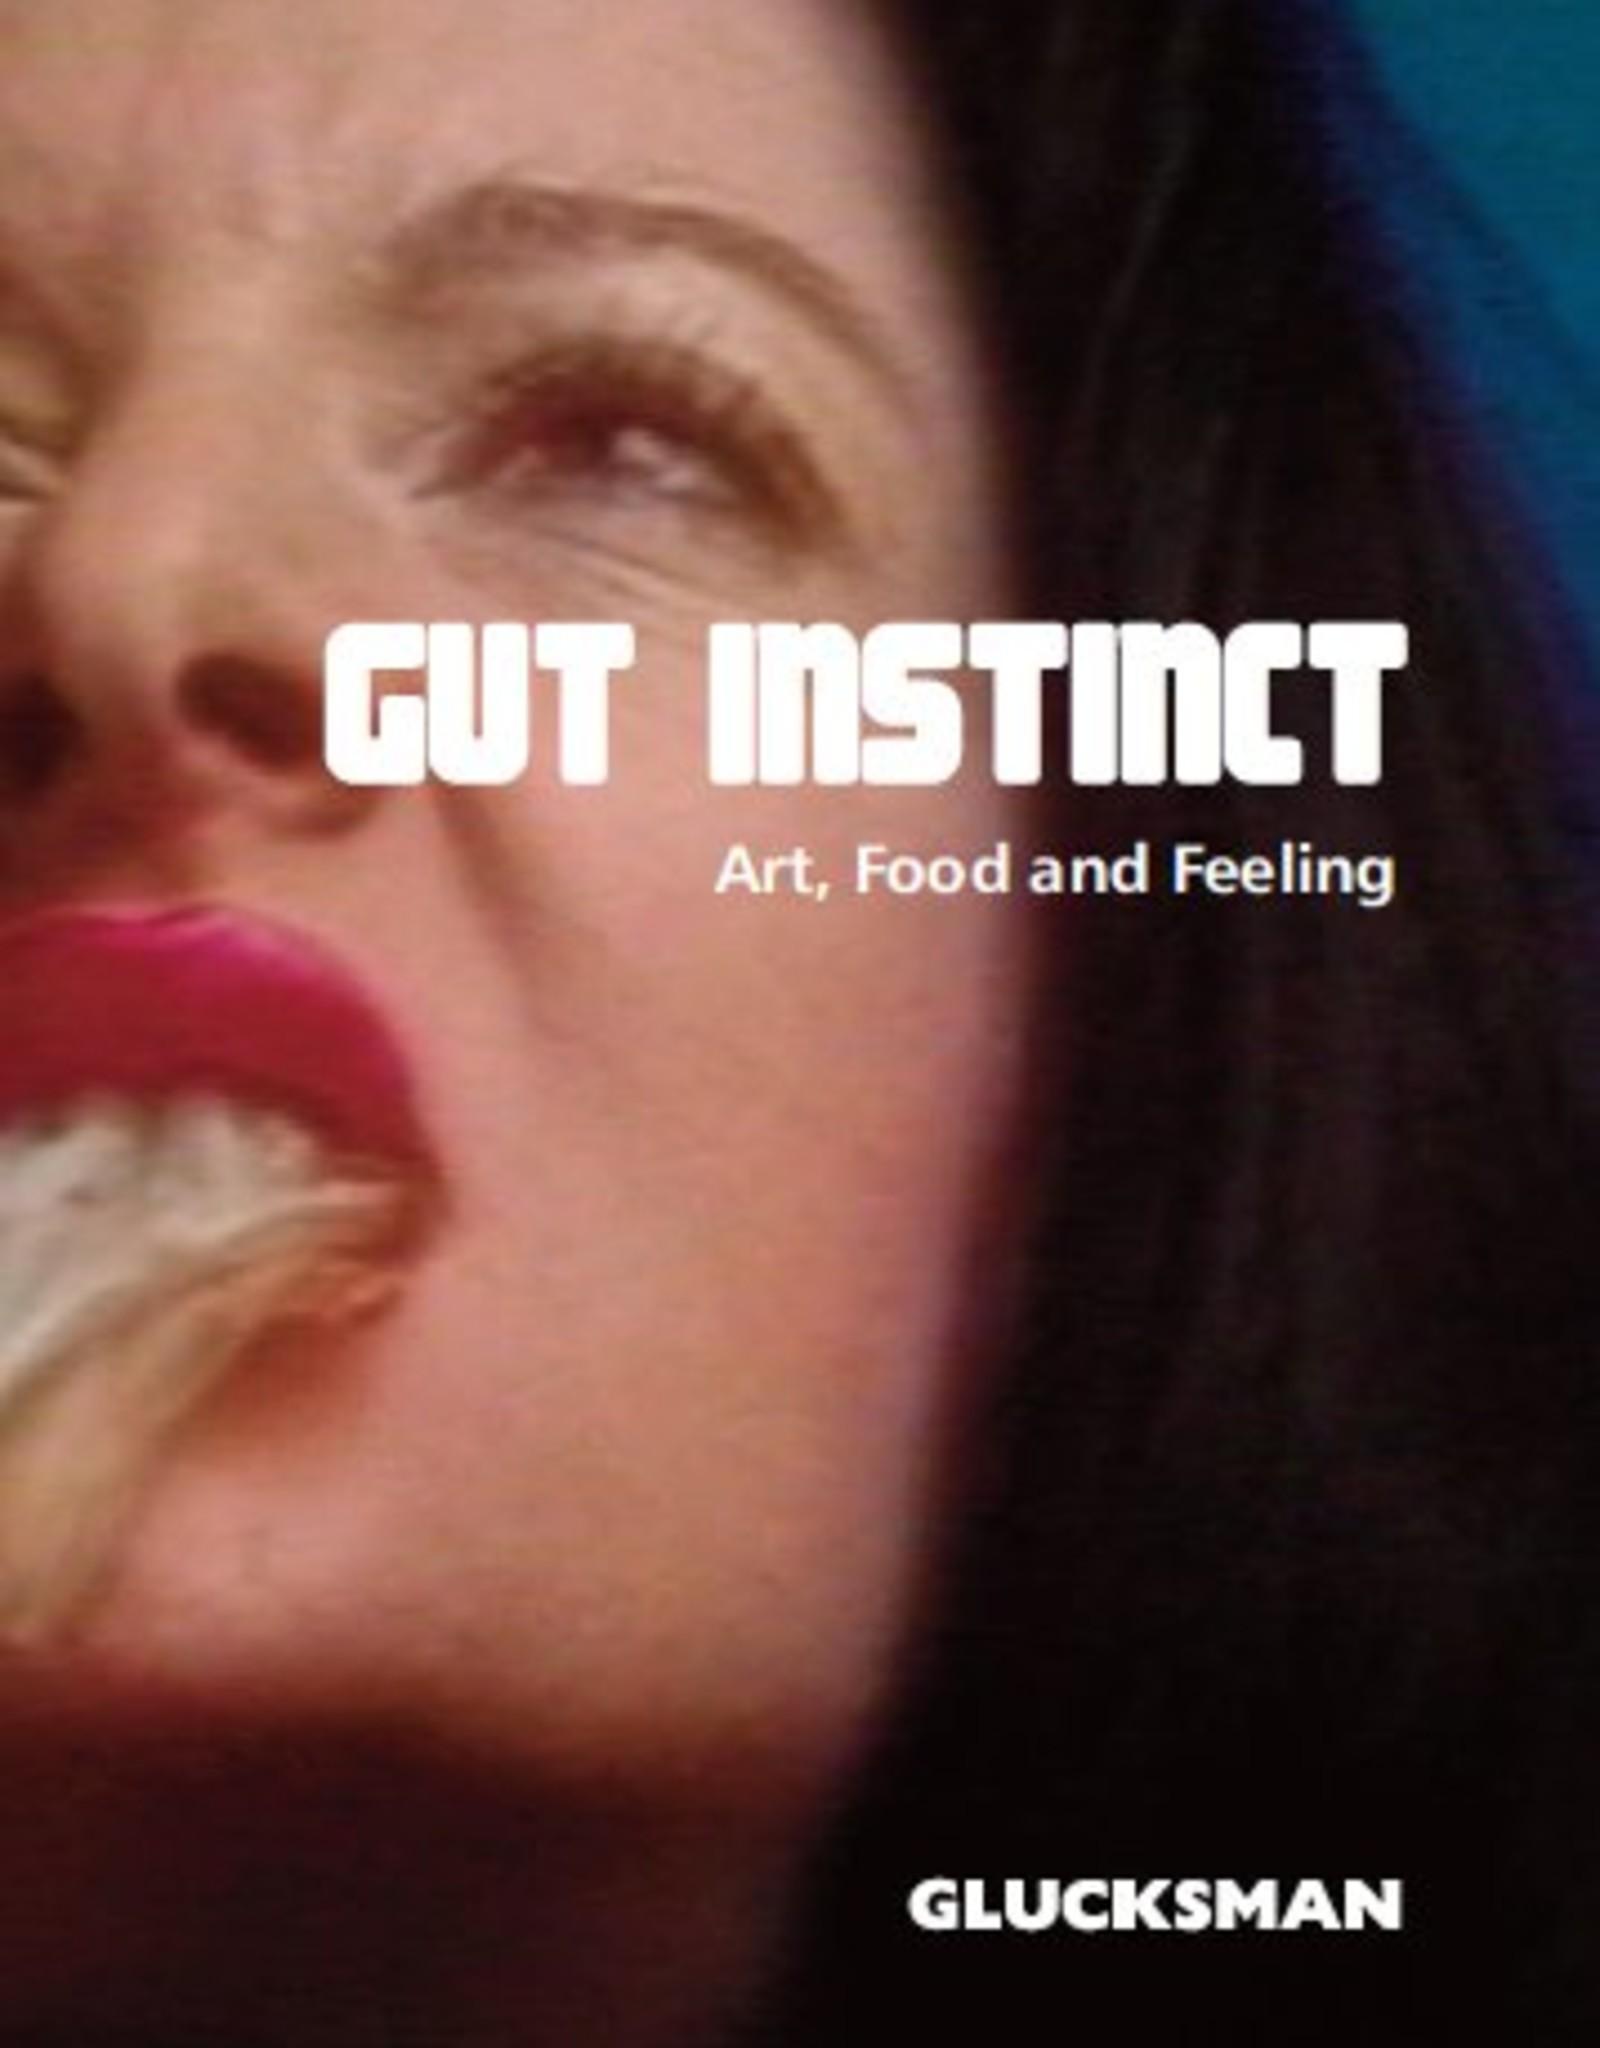 The Glucksman Gut Instinct; Art, Food and Feeling